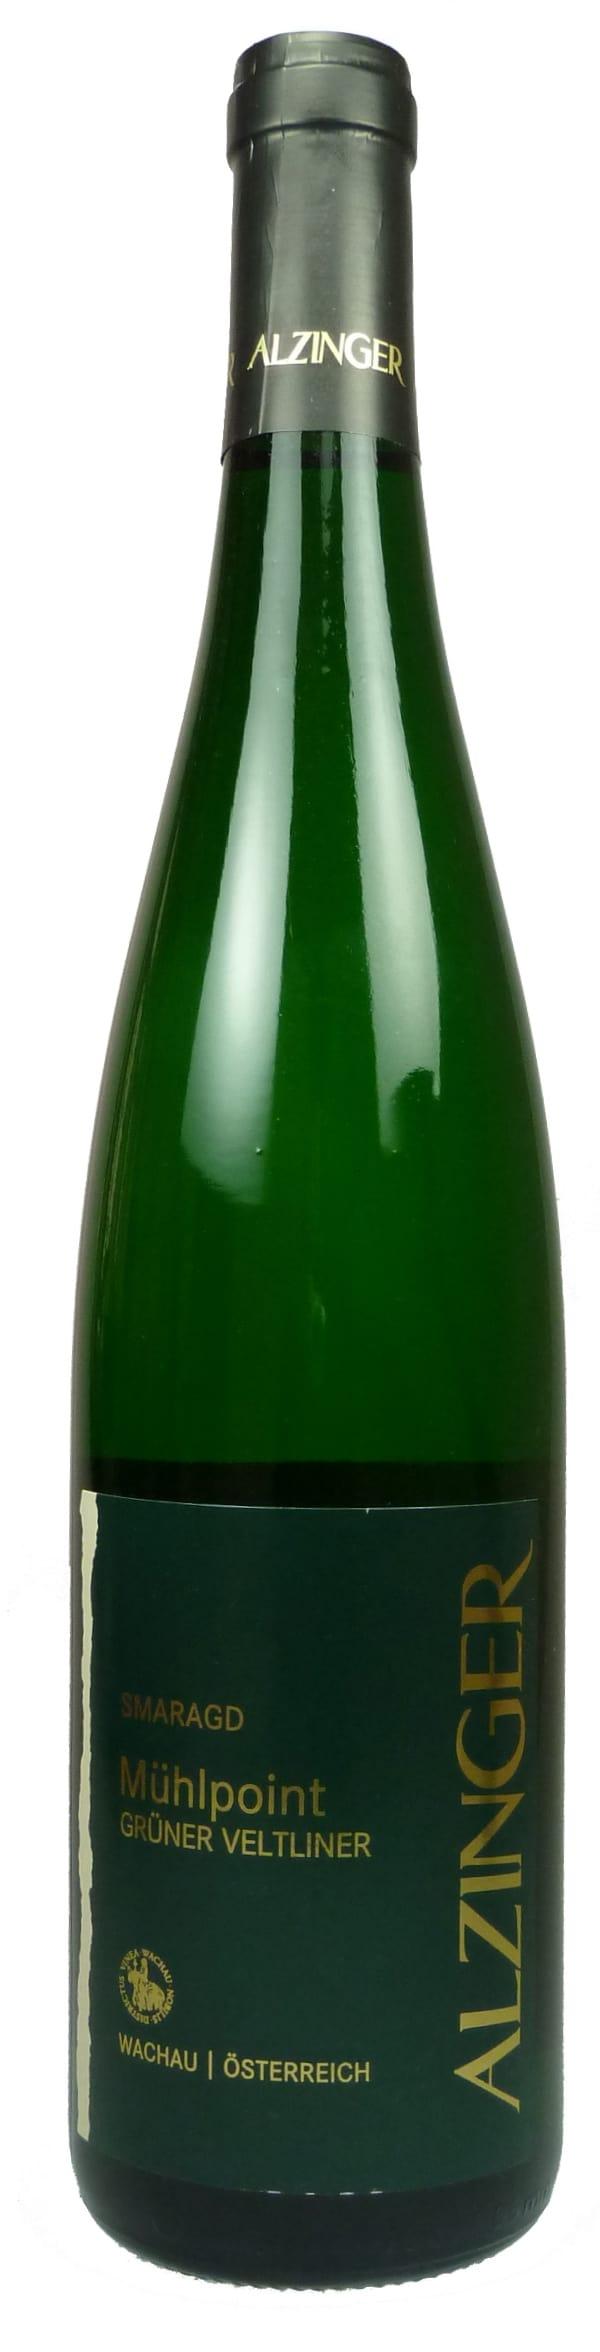 Grüner Veltliner Mühlpoint Smaragd 2019